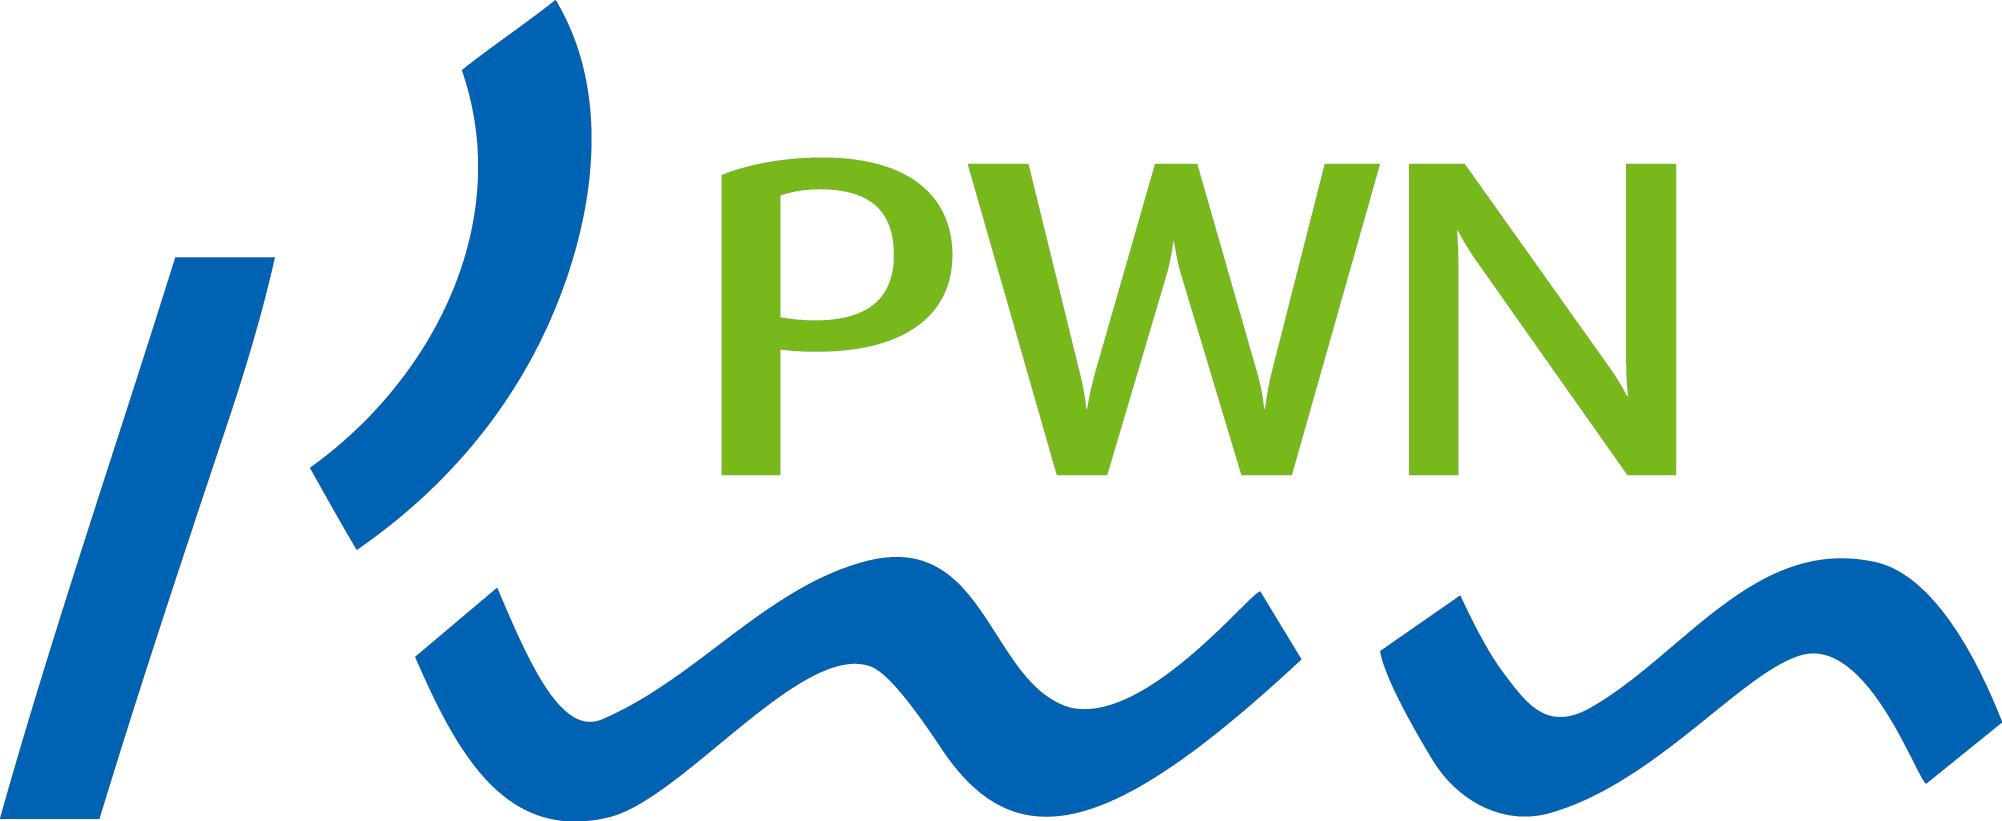 https://www.waterforlife.nl/files/logos/Logo_PWN_2012_zonder-achtergrond.png